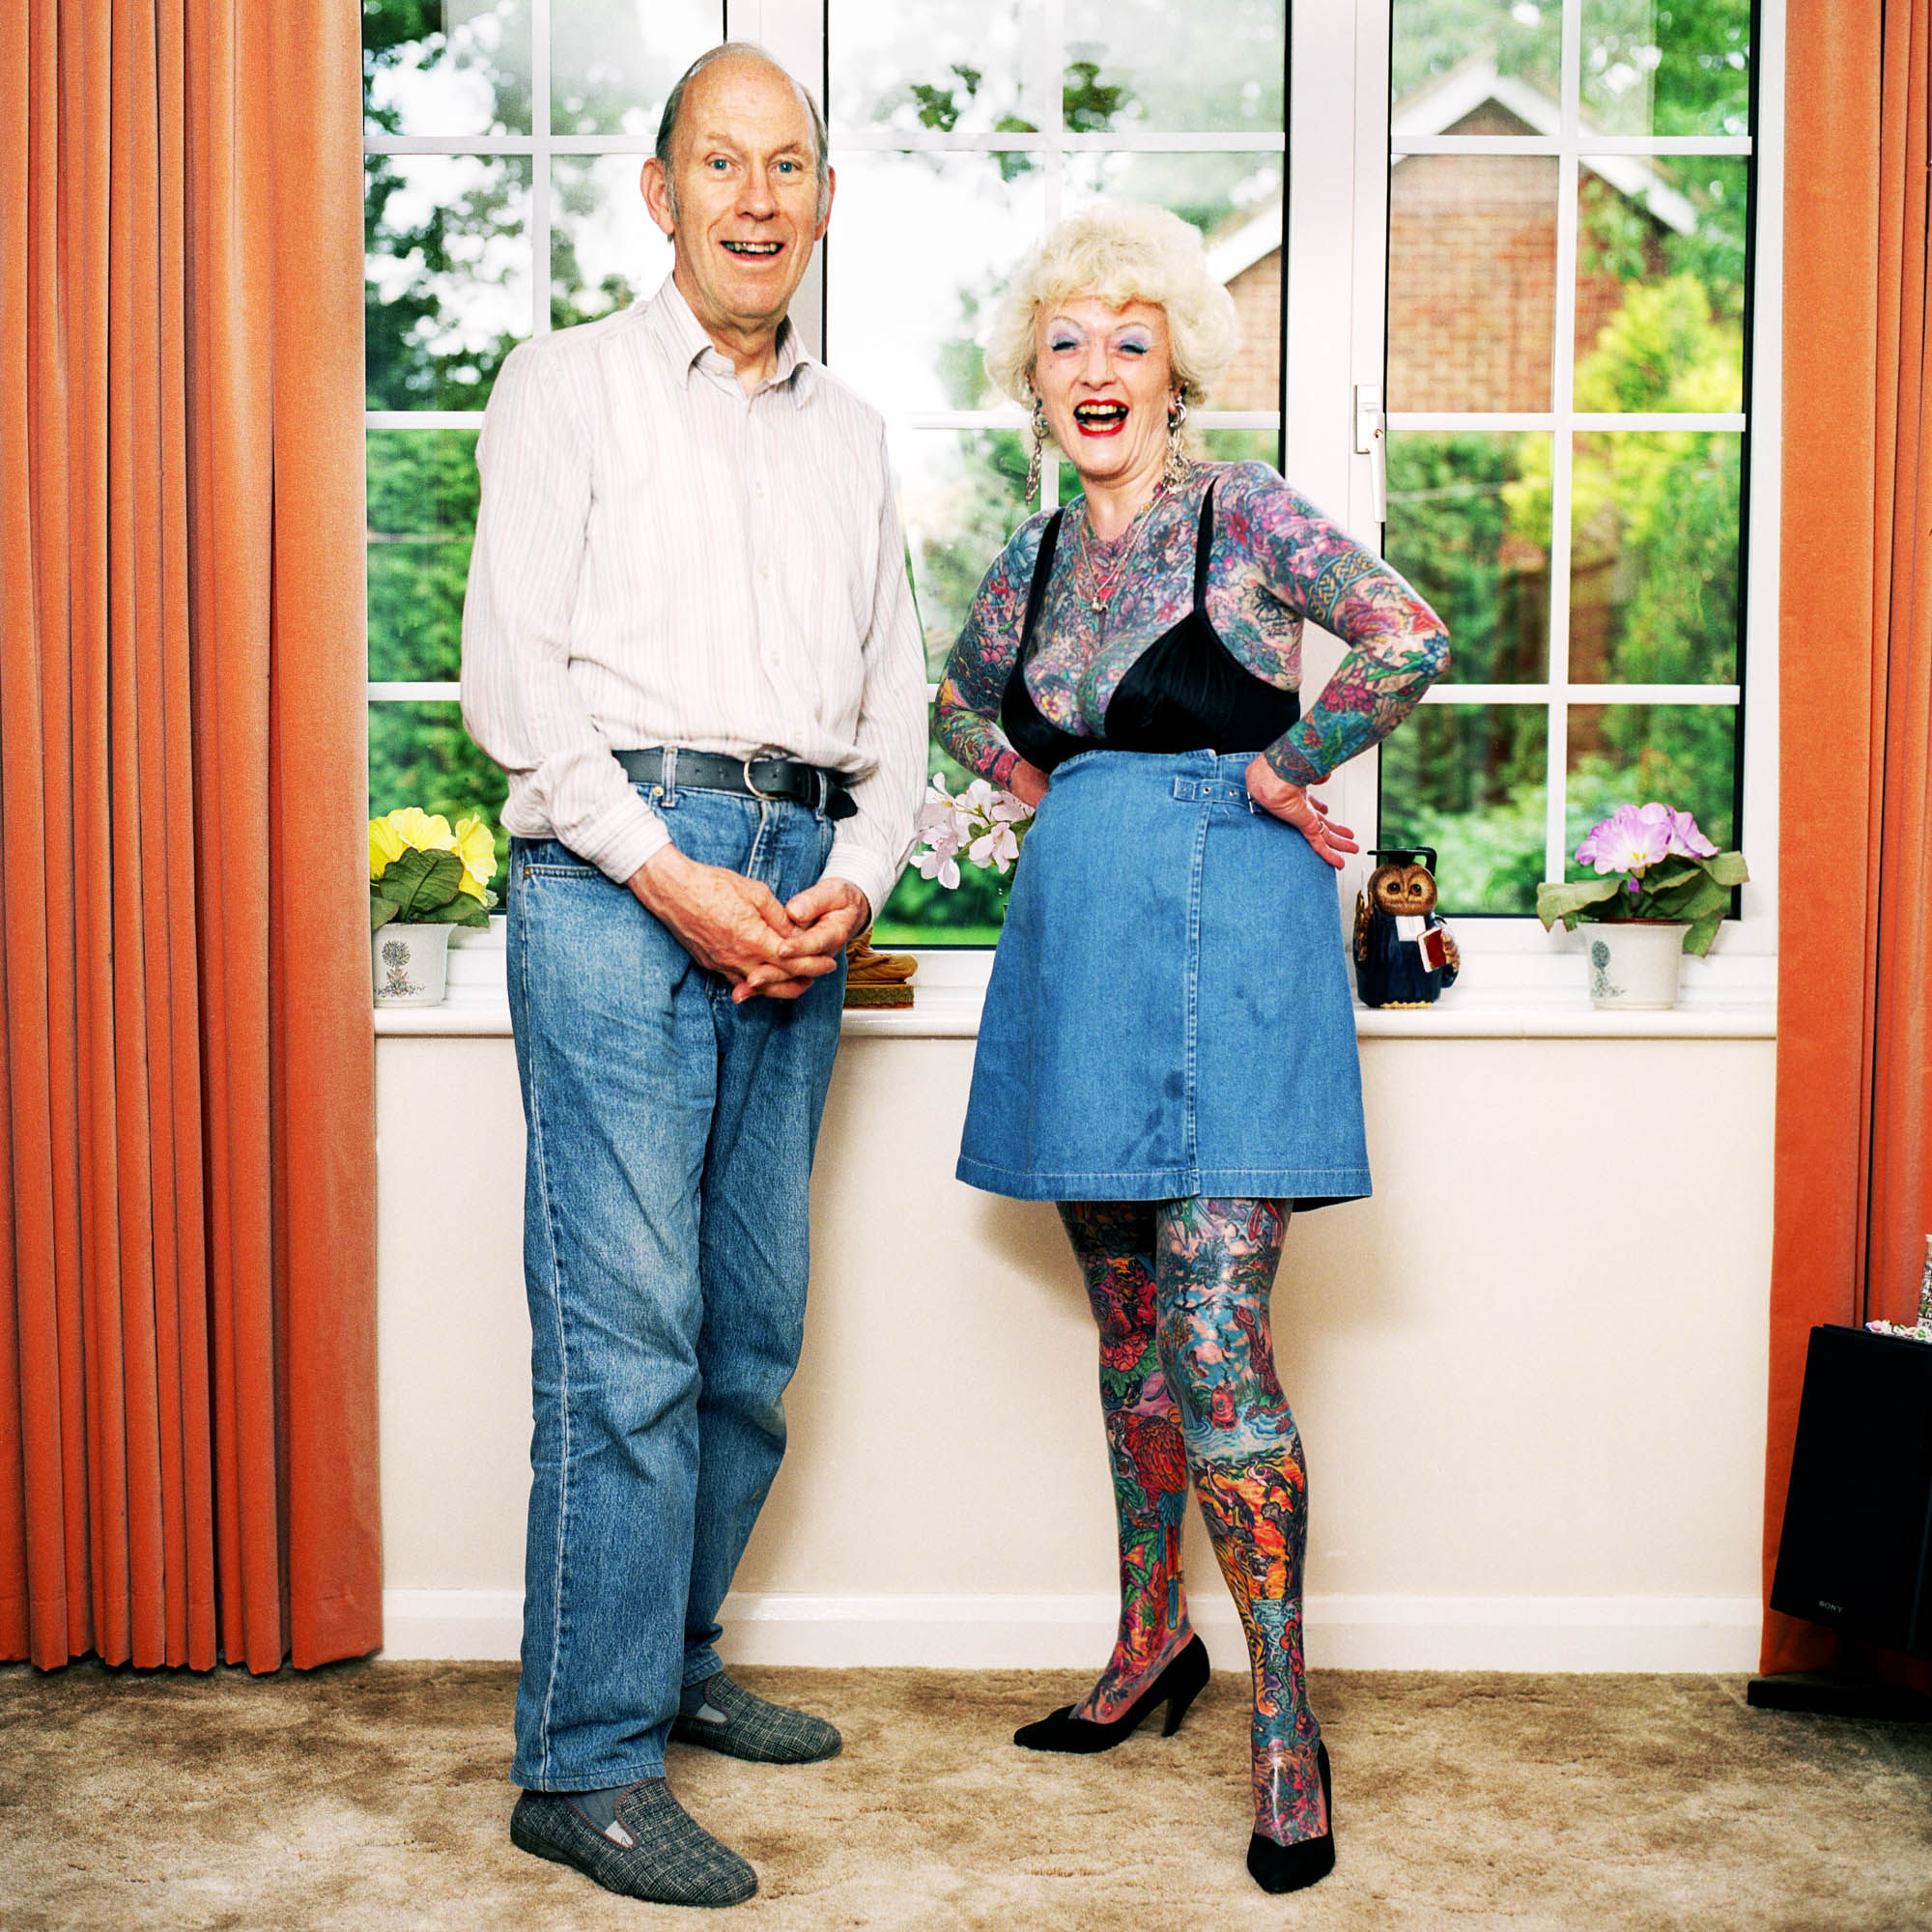 Фото бабушки на коленях 20 фотография